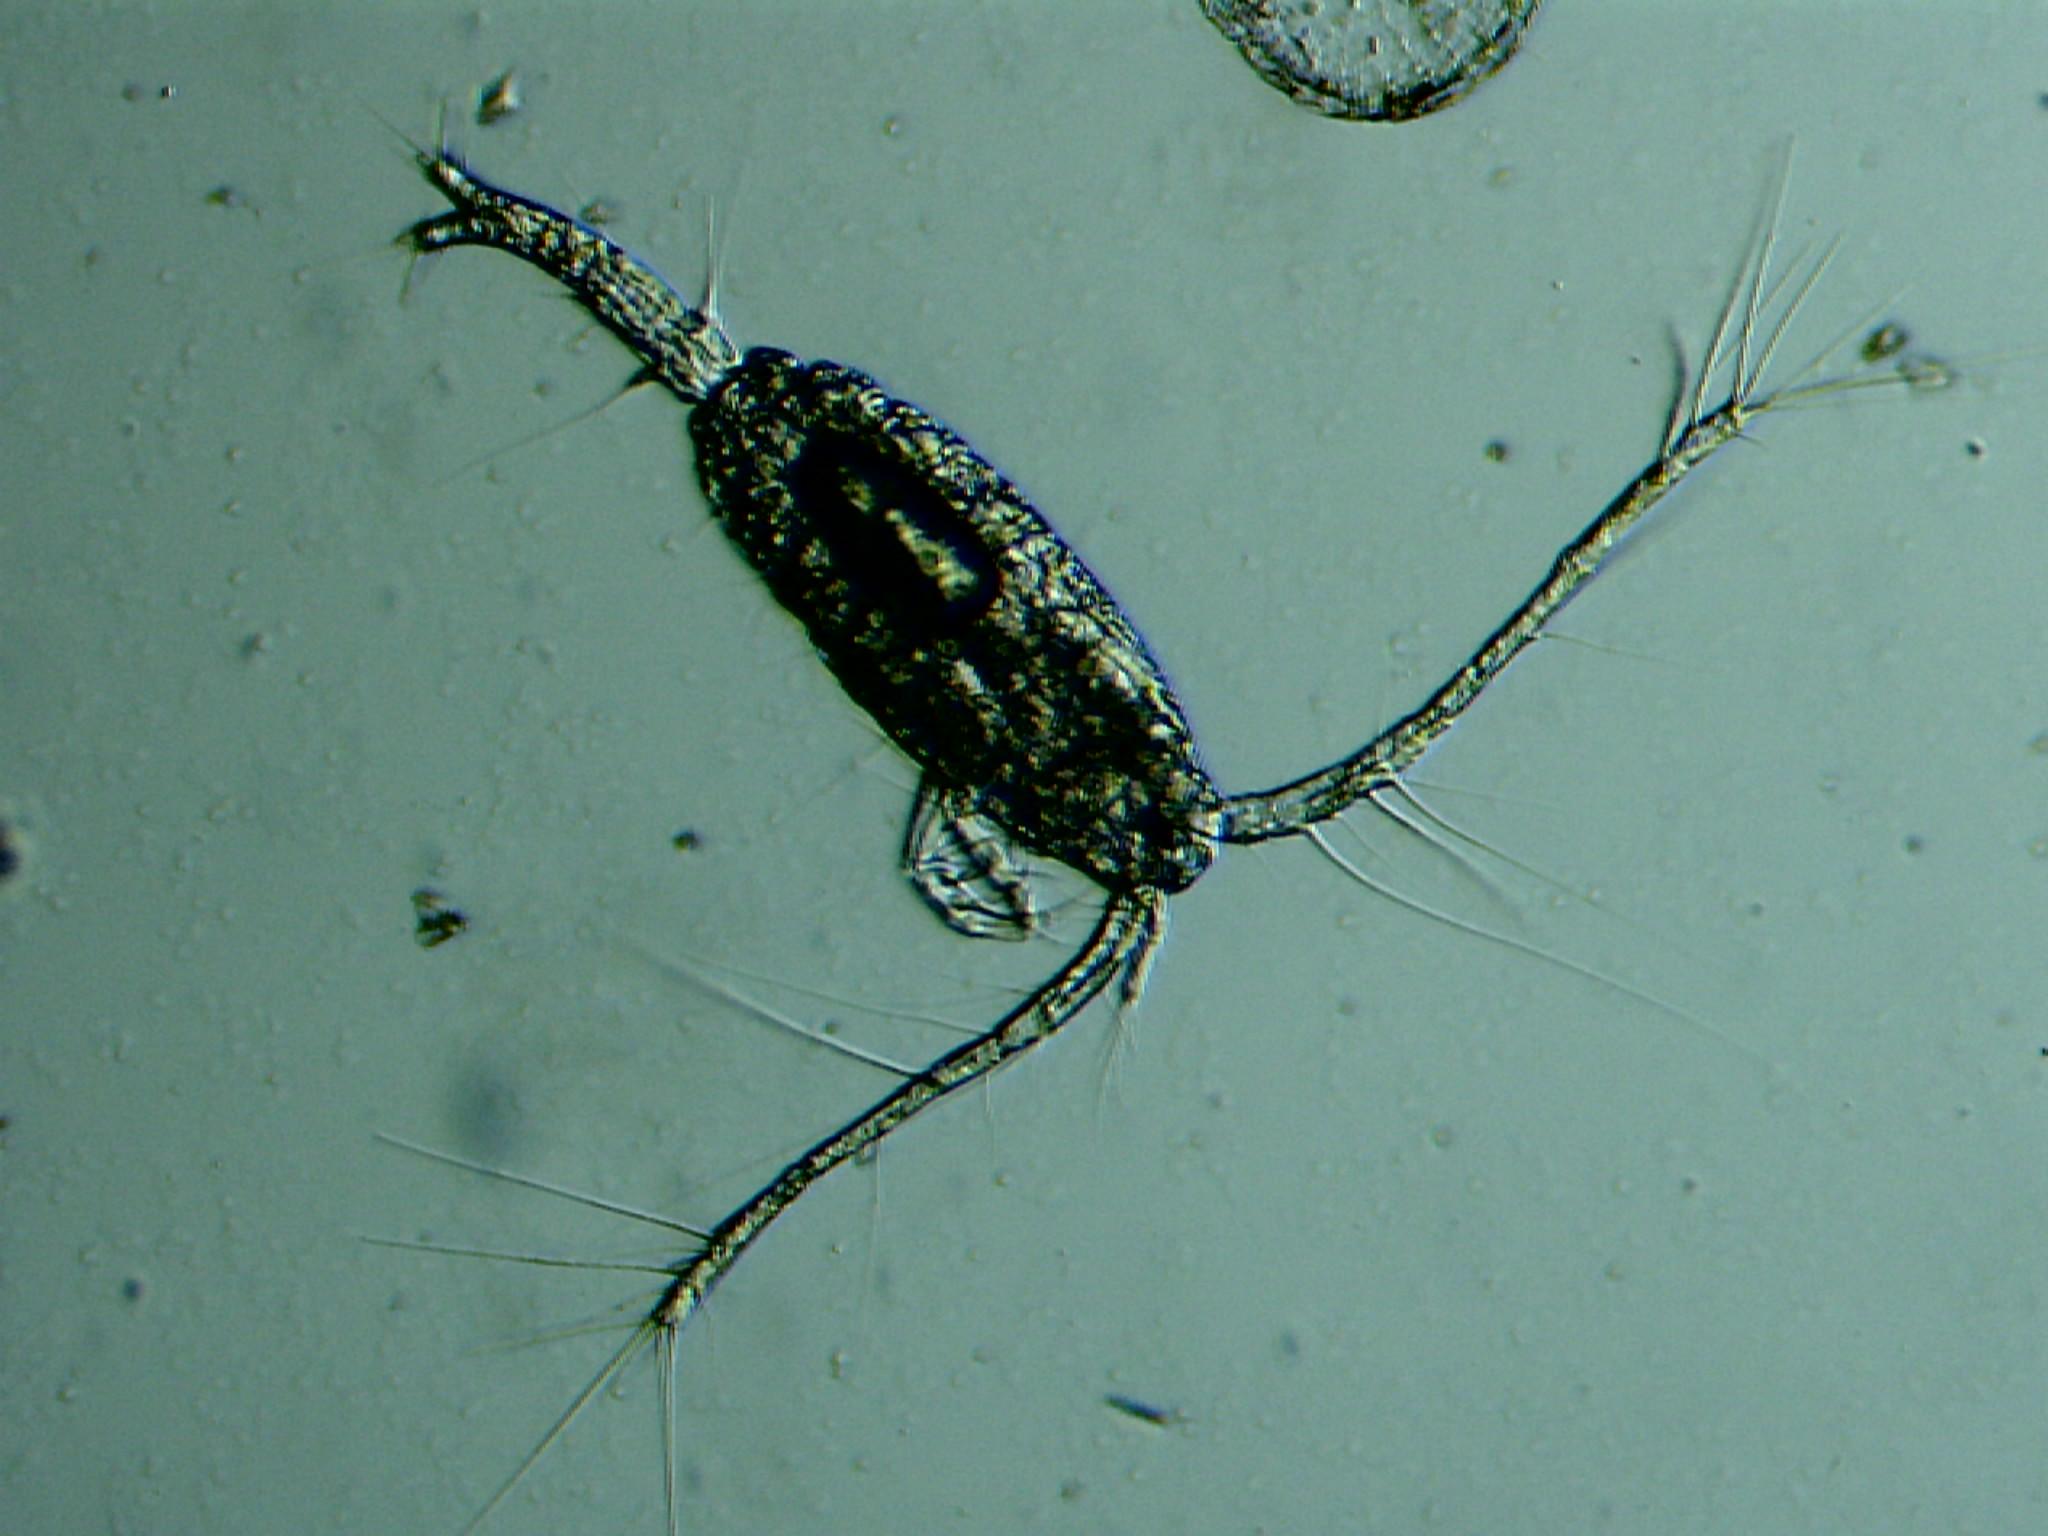 Plancton du Monde : phytoplancton zooplancton finistère